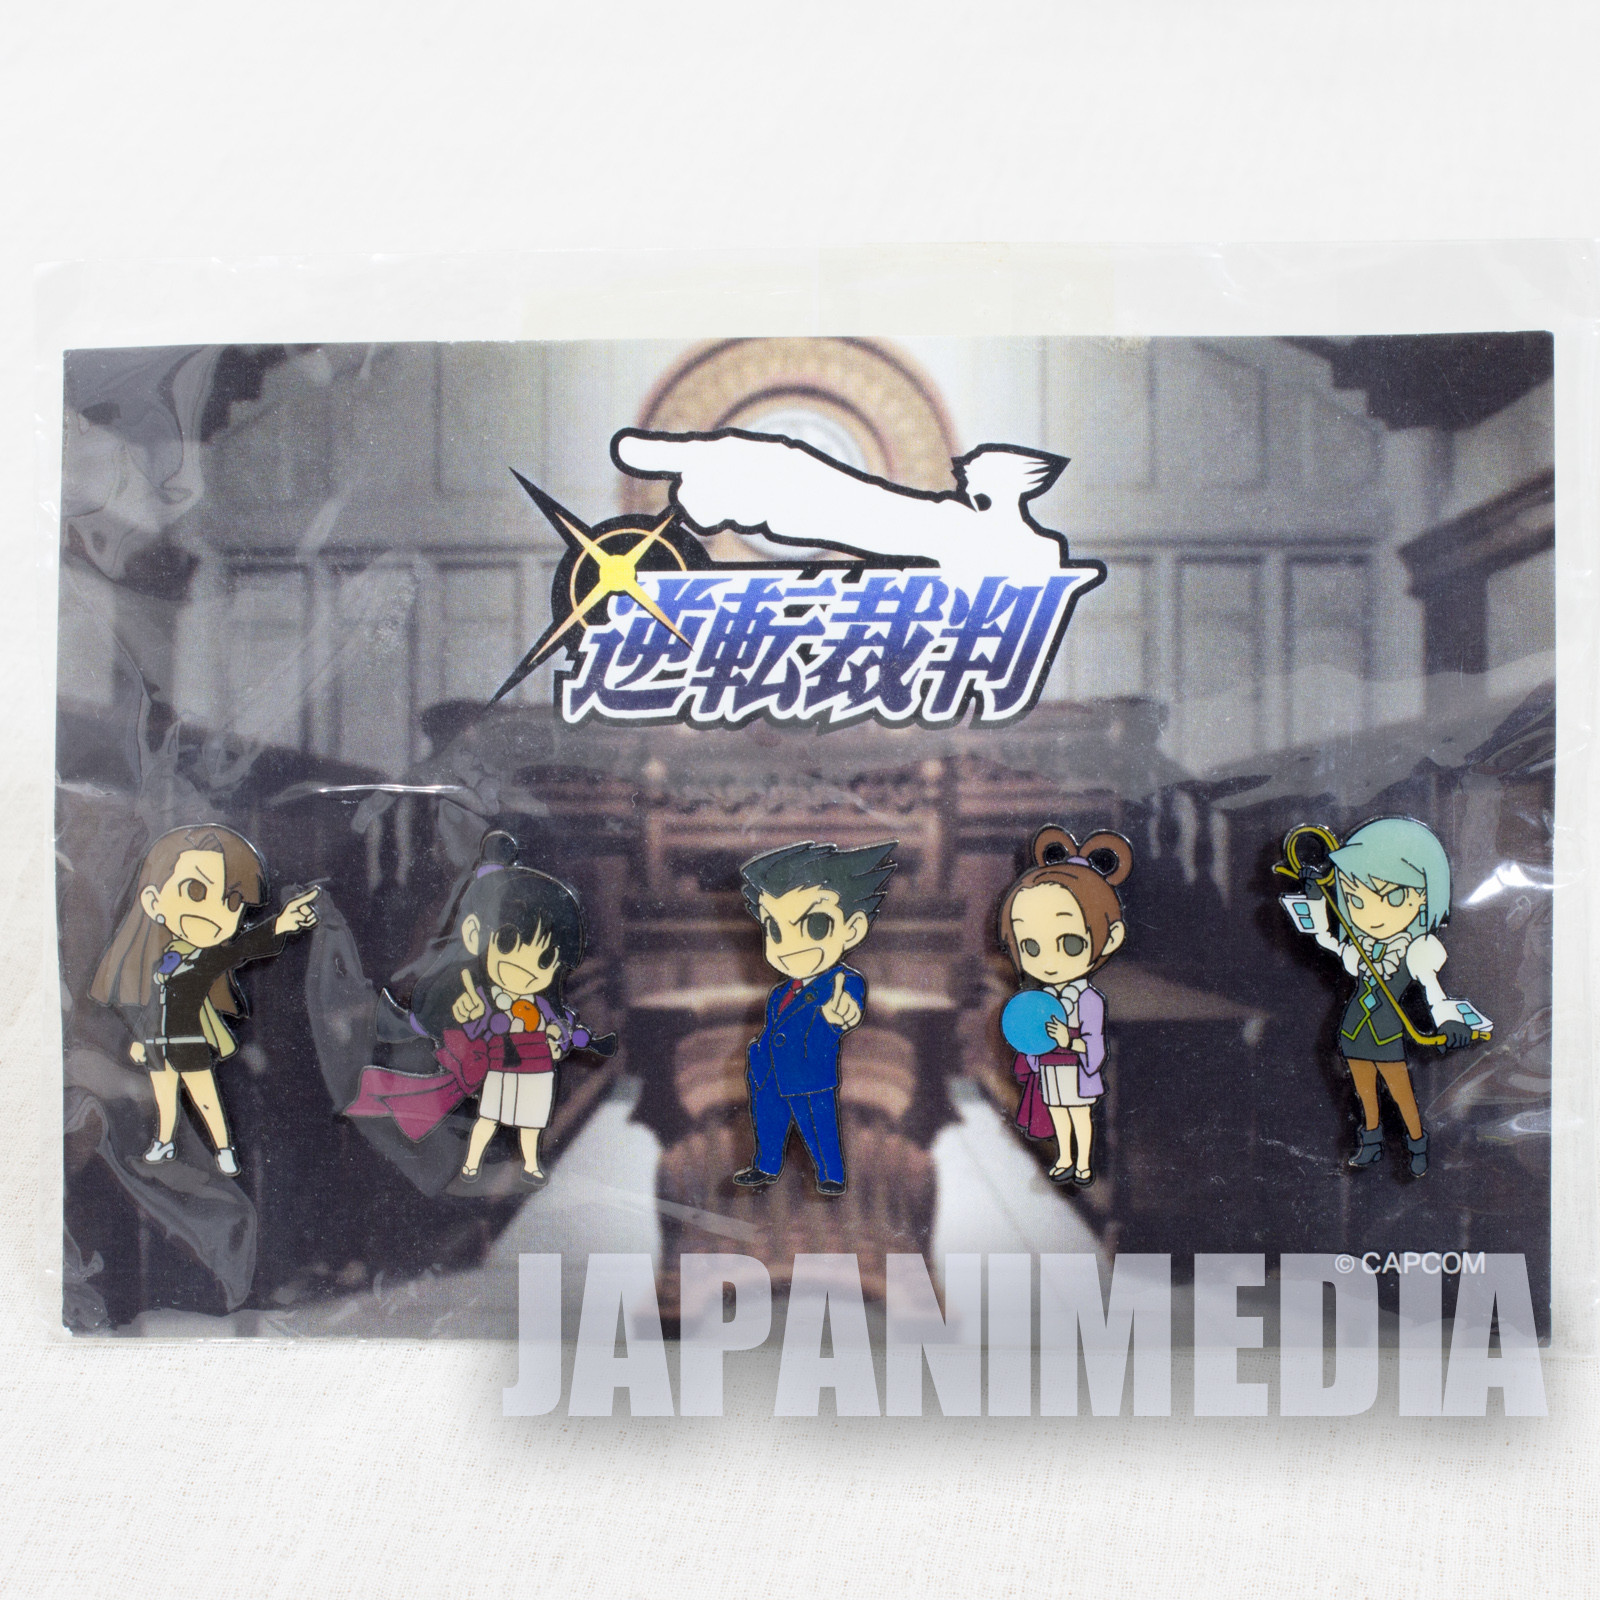 Ace Attorney Gyakuten Saiban Pins 5pc set [Ryuichi Naruhodo / Mayoi / Chihiro / Harumi / Karuma Mei]  Capcom Phoenix Wright